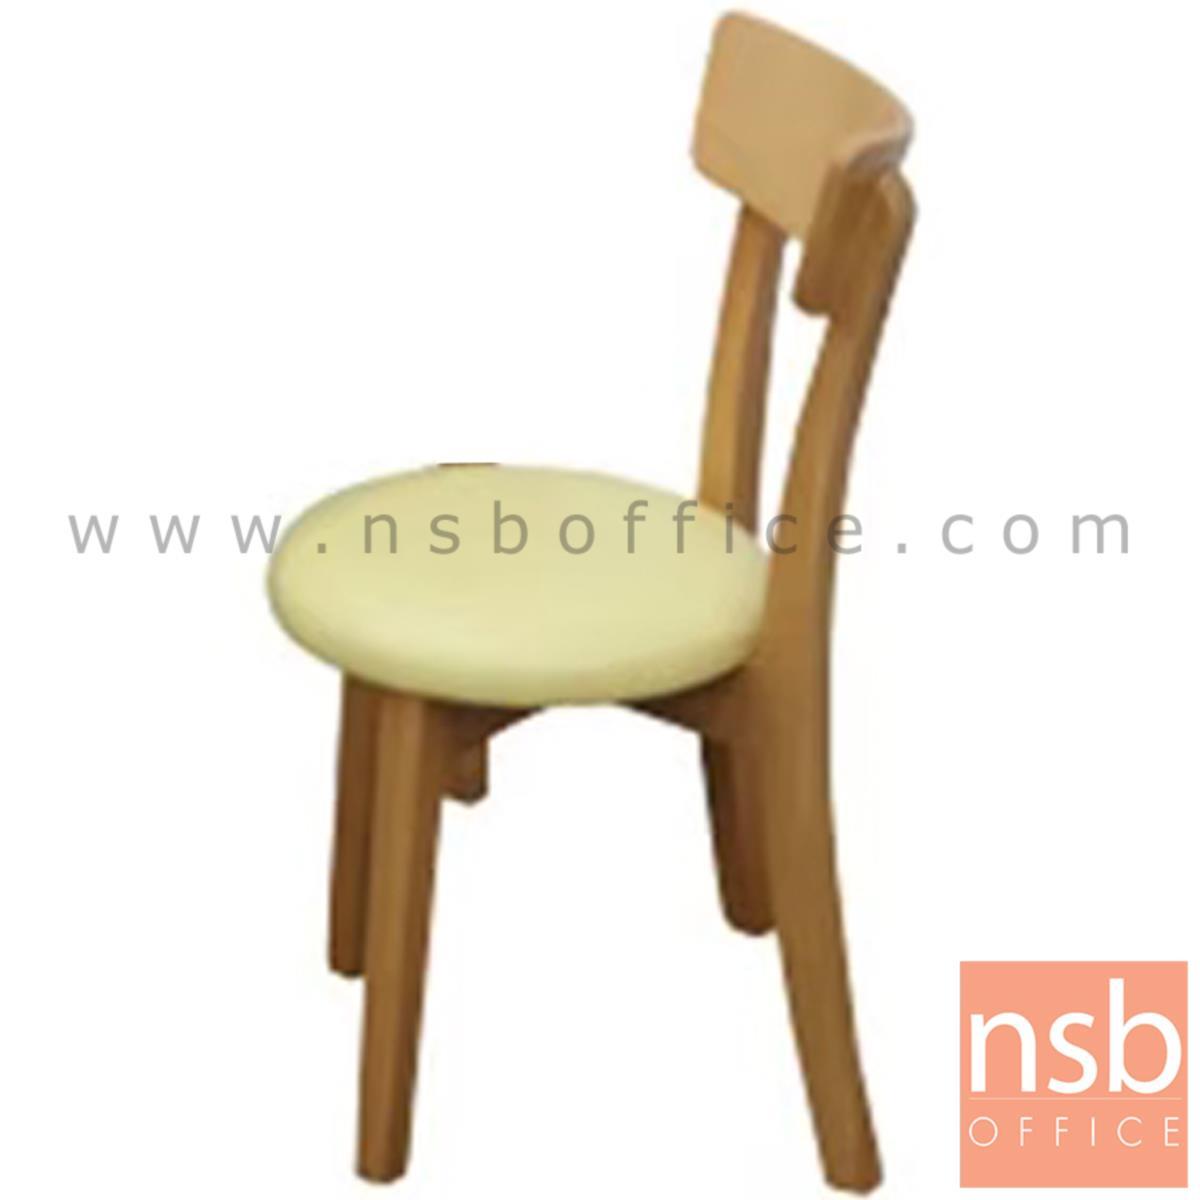 B22A155:เก้าอี้ไม้ที่นั่งหนังเทียม รุ่น Frollo   ขาไม้